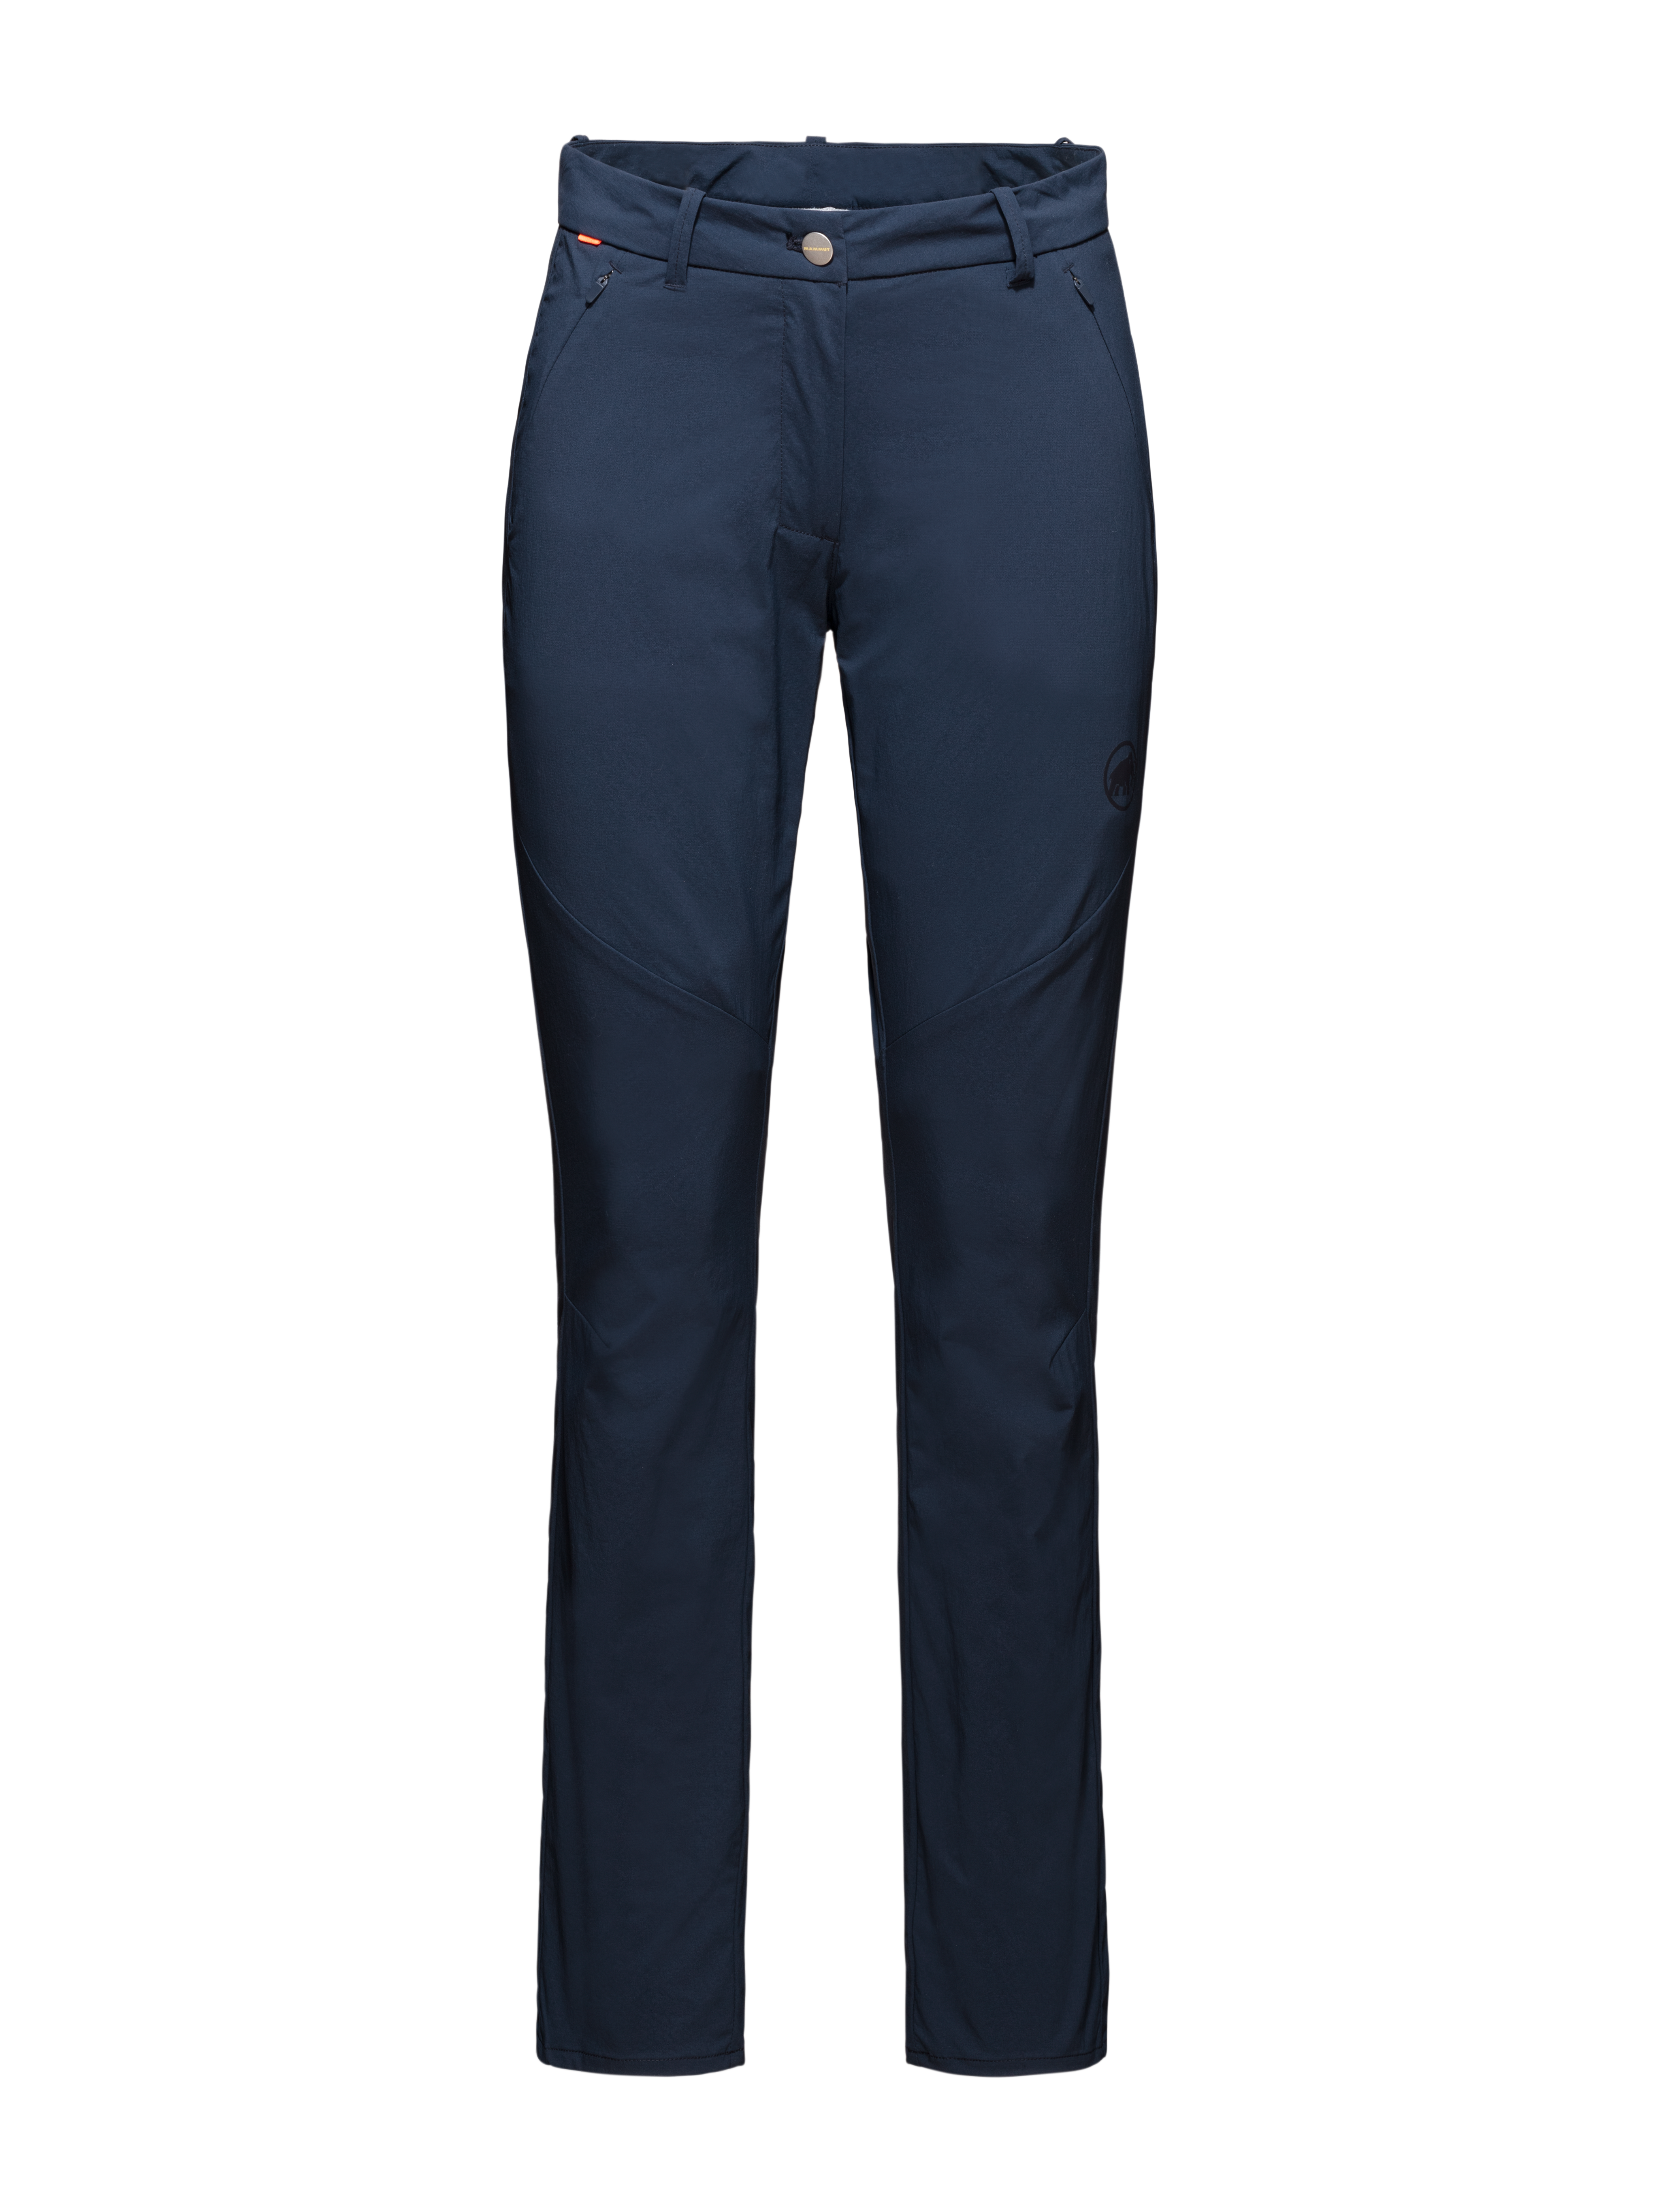 Hiking Pants Women product image